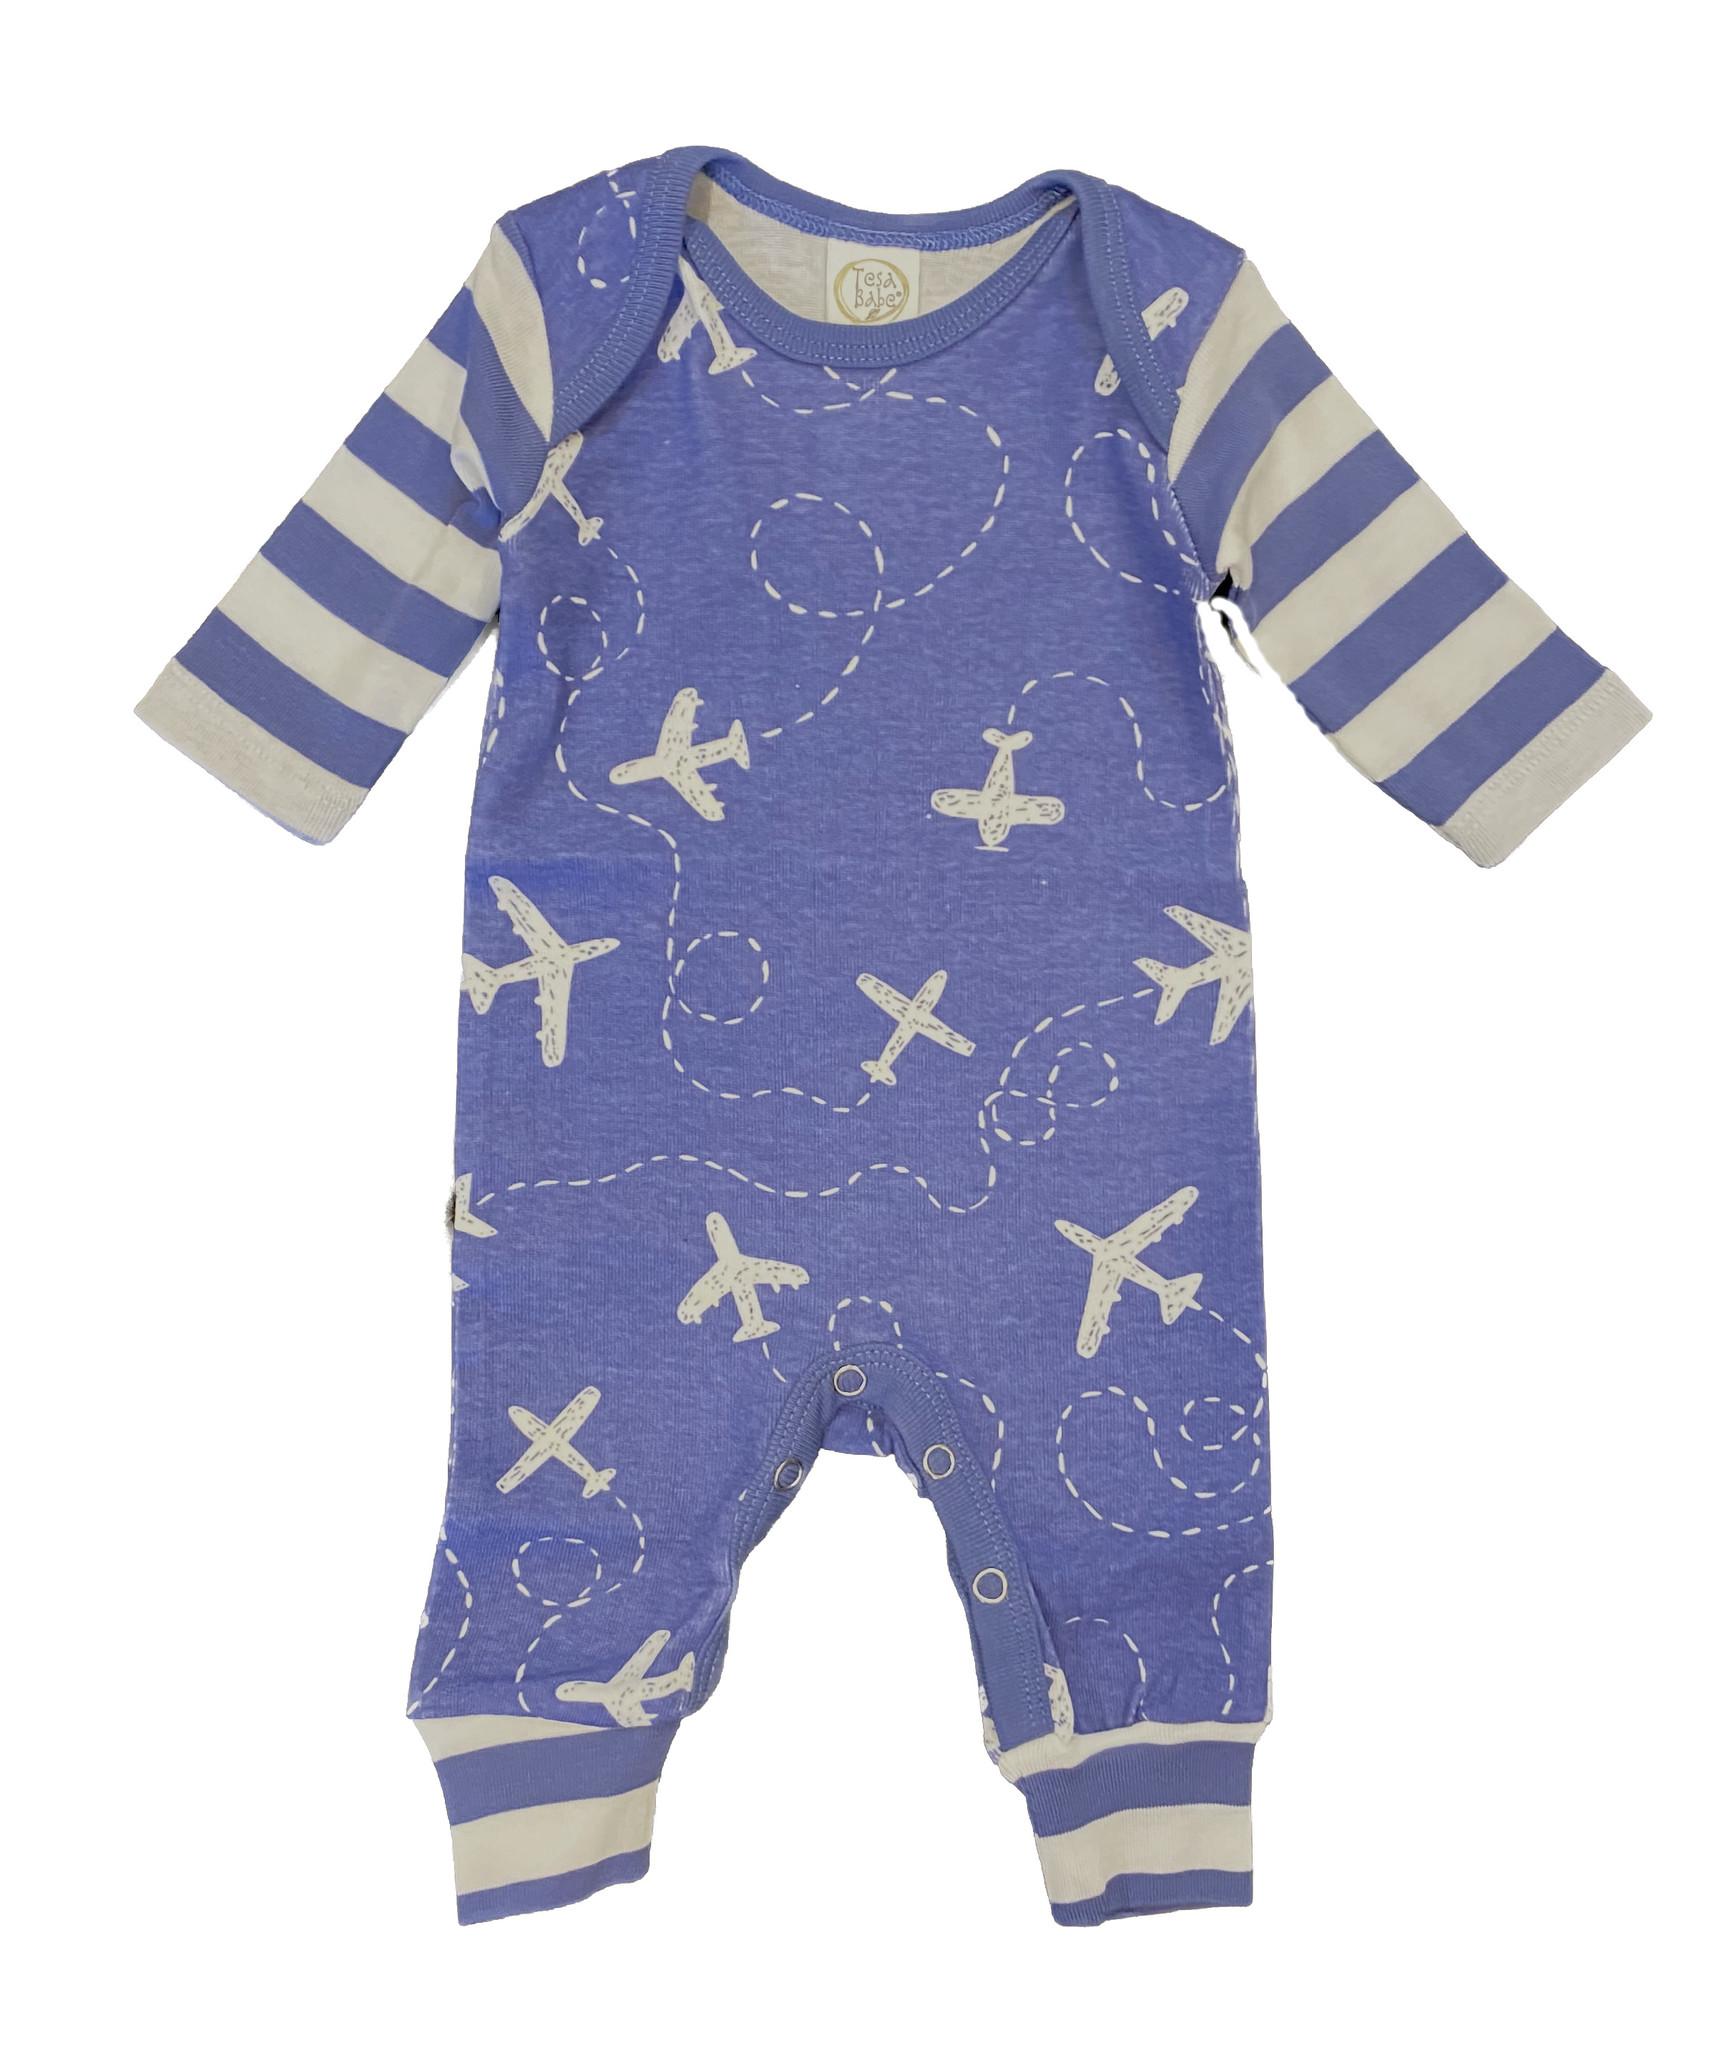 Tesa Babe Blue Airplane Romper